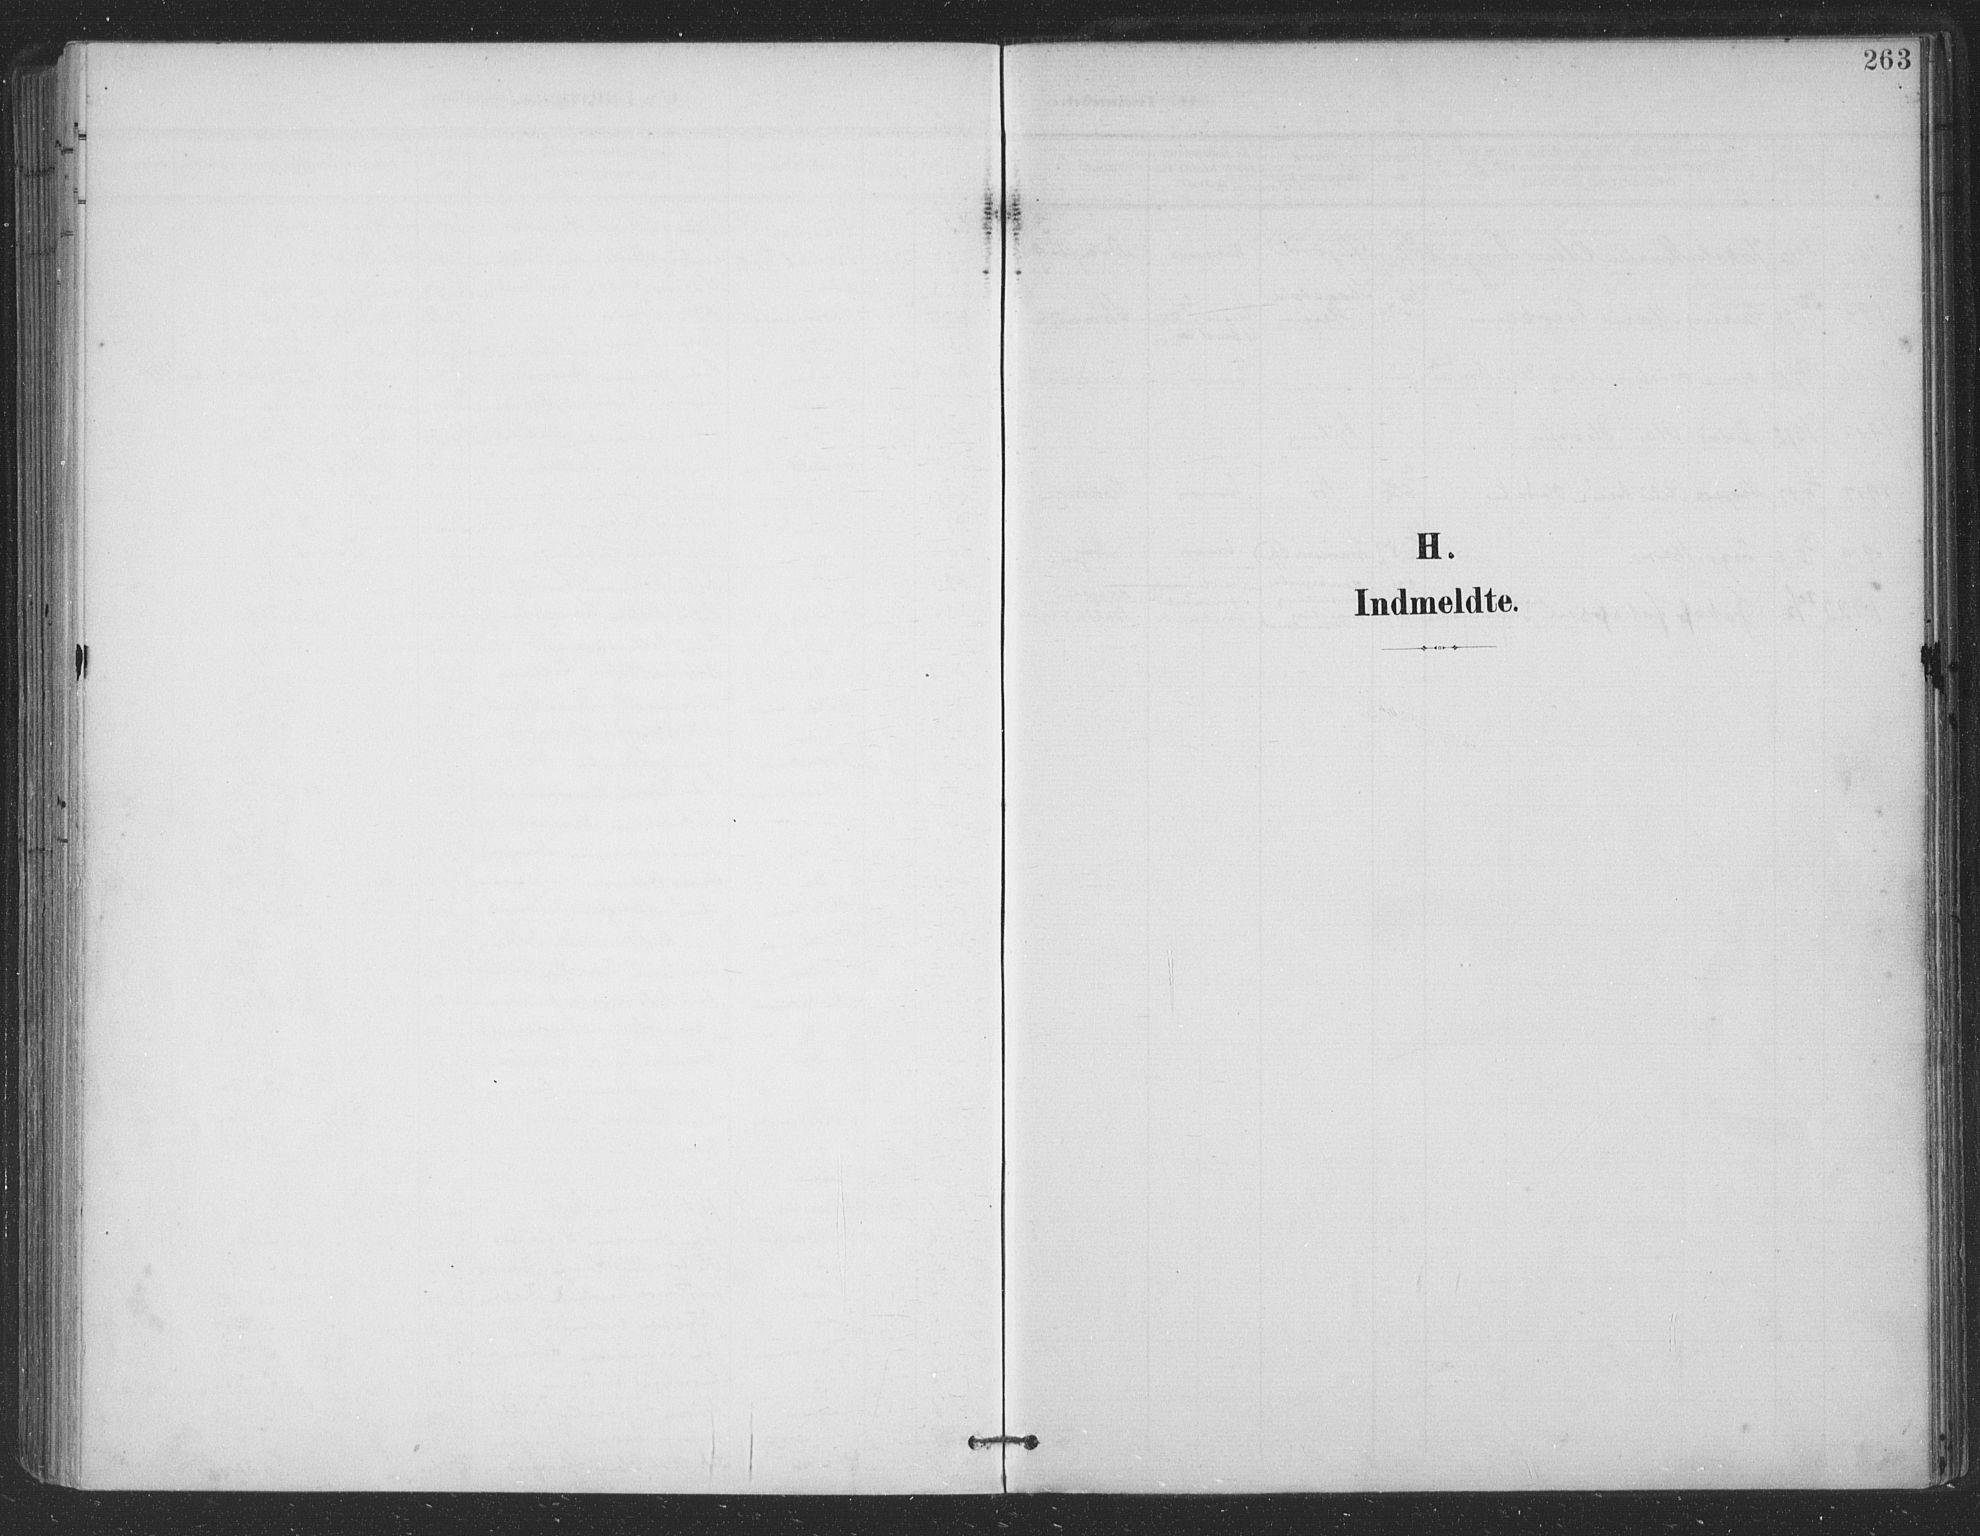 SAT, Ministerialprotokoller, klokkerbøker og fødselsregistre - Nordland, 863/L0899: Ministerialbok nr. 863A11, 1897-1906, s. 263